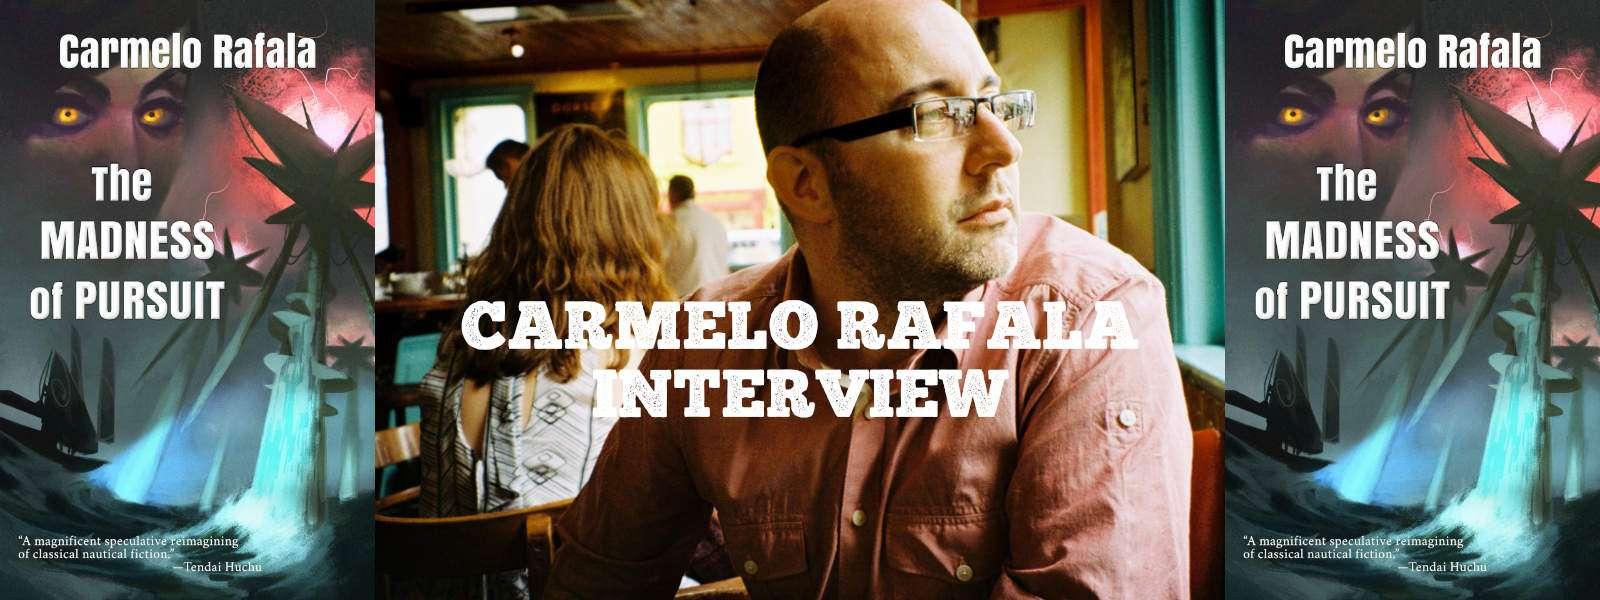 Carmelo-Rafala-Interview